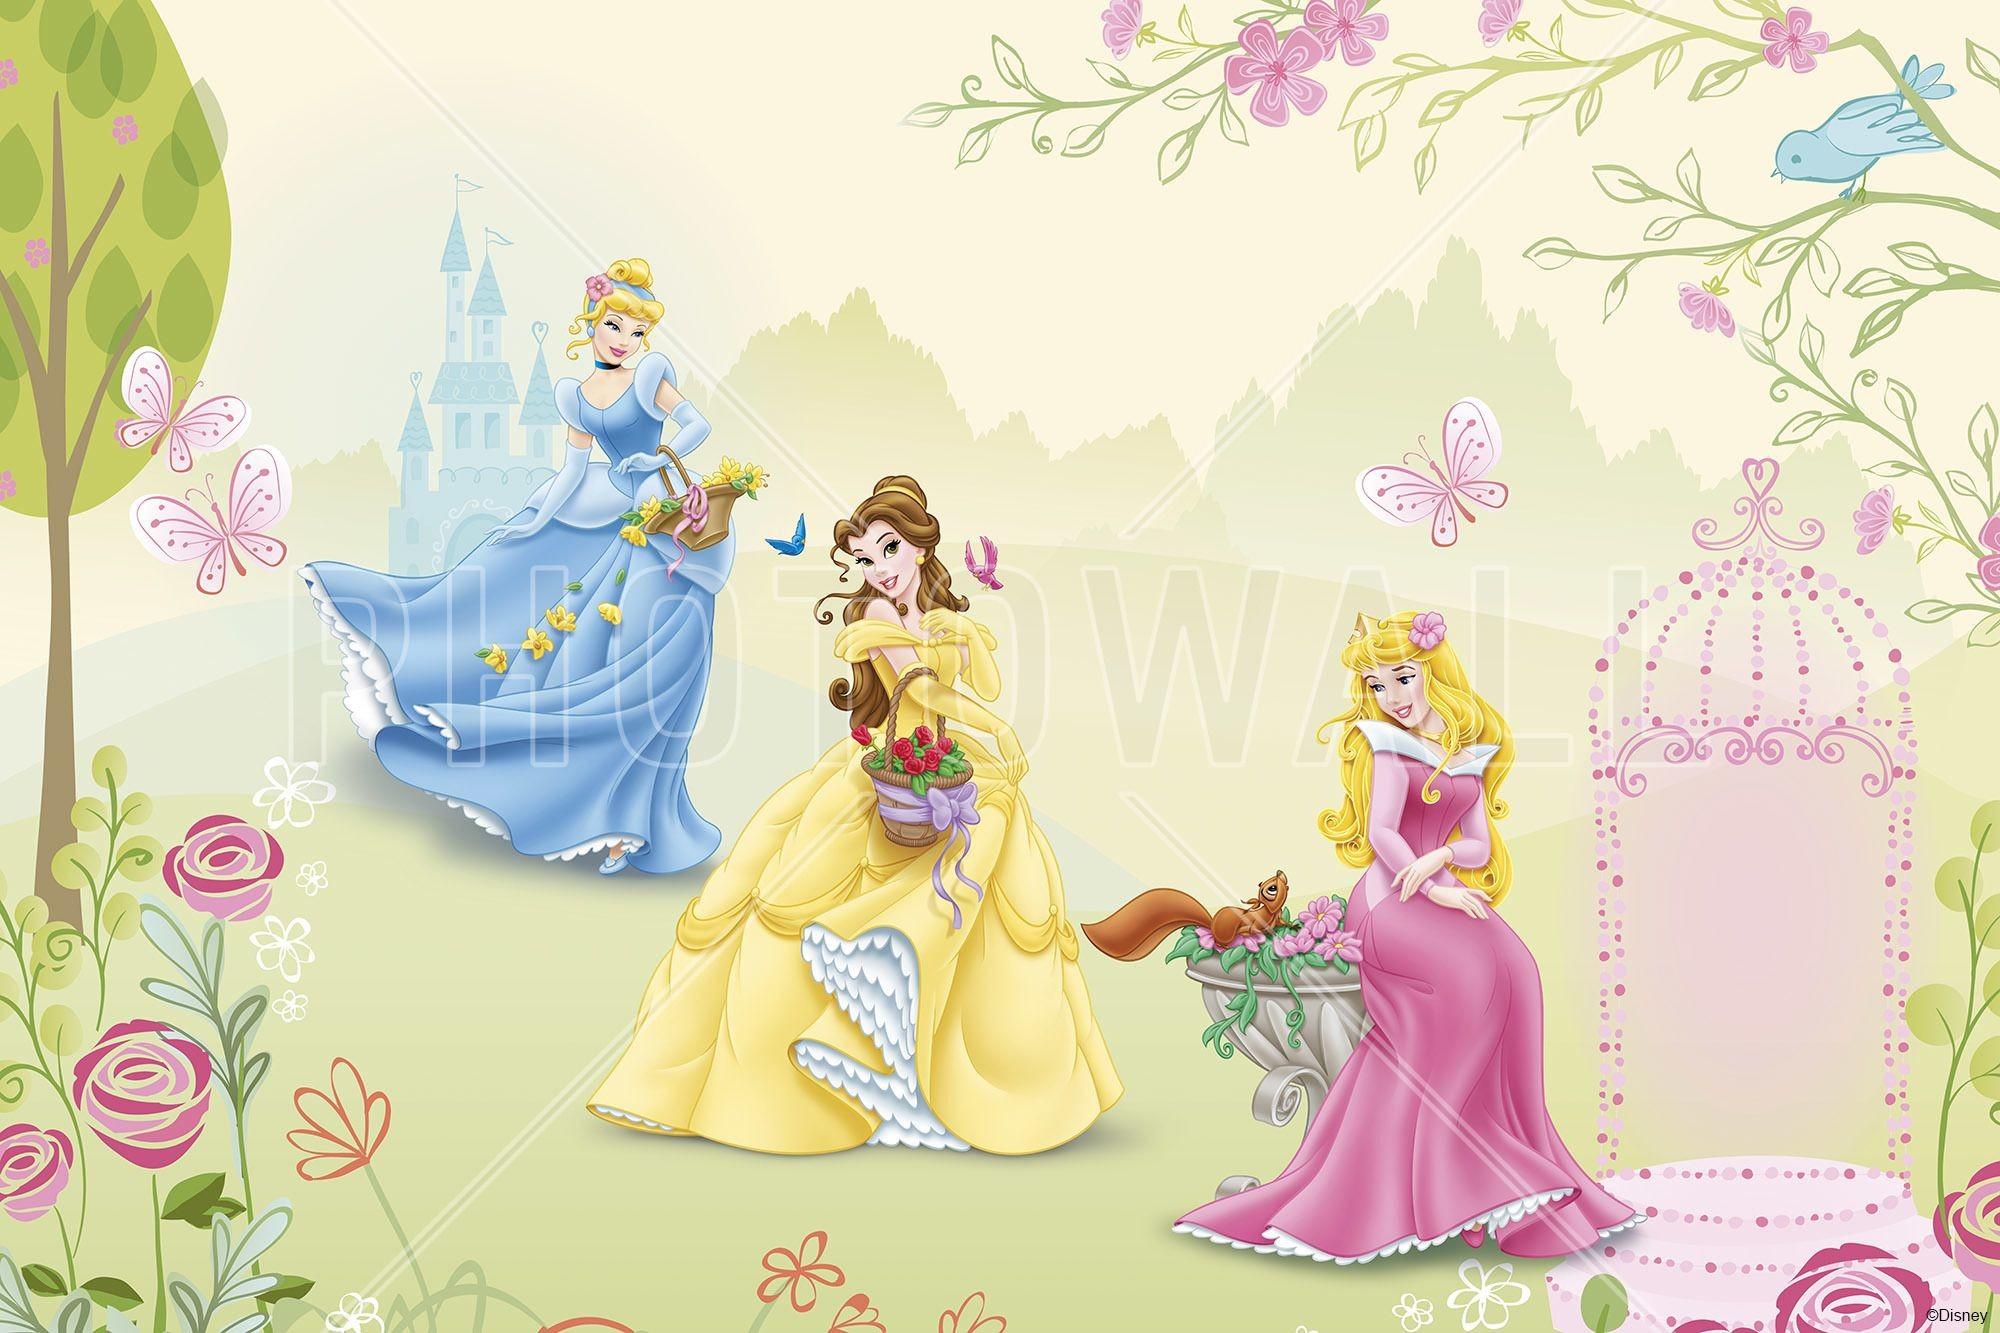 Res: 2000x1333, Princess Belle Wallpapers Wallpaper